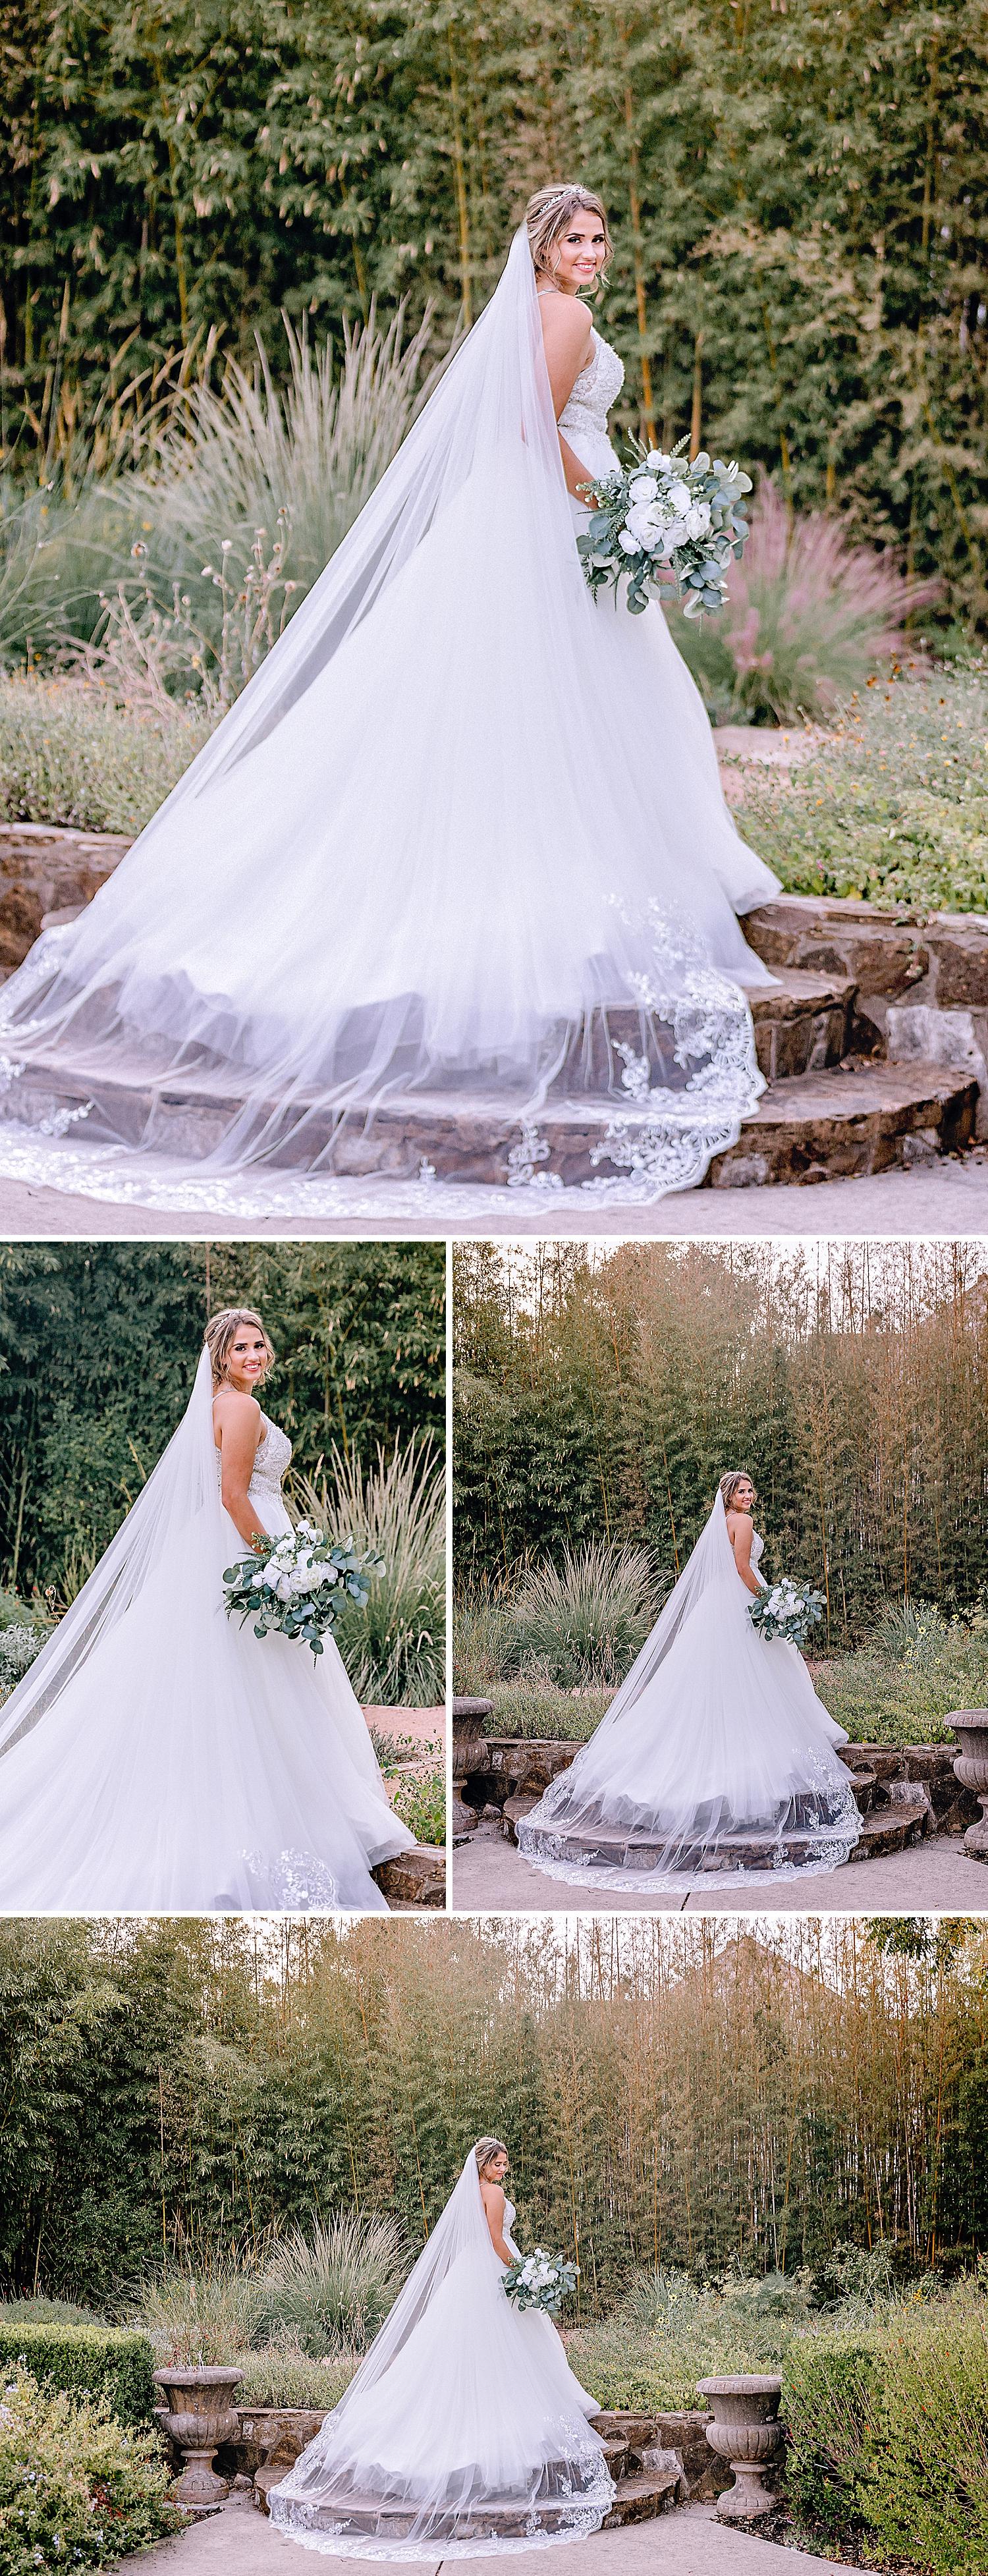 San-Antonio-Weddings-Bridal-Photos-Carly-Barton-Photography_0007.jpg